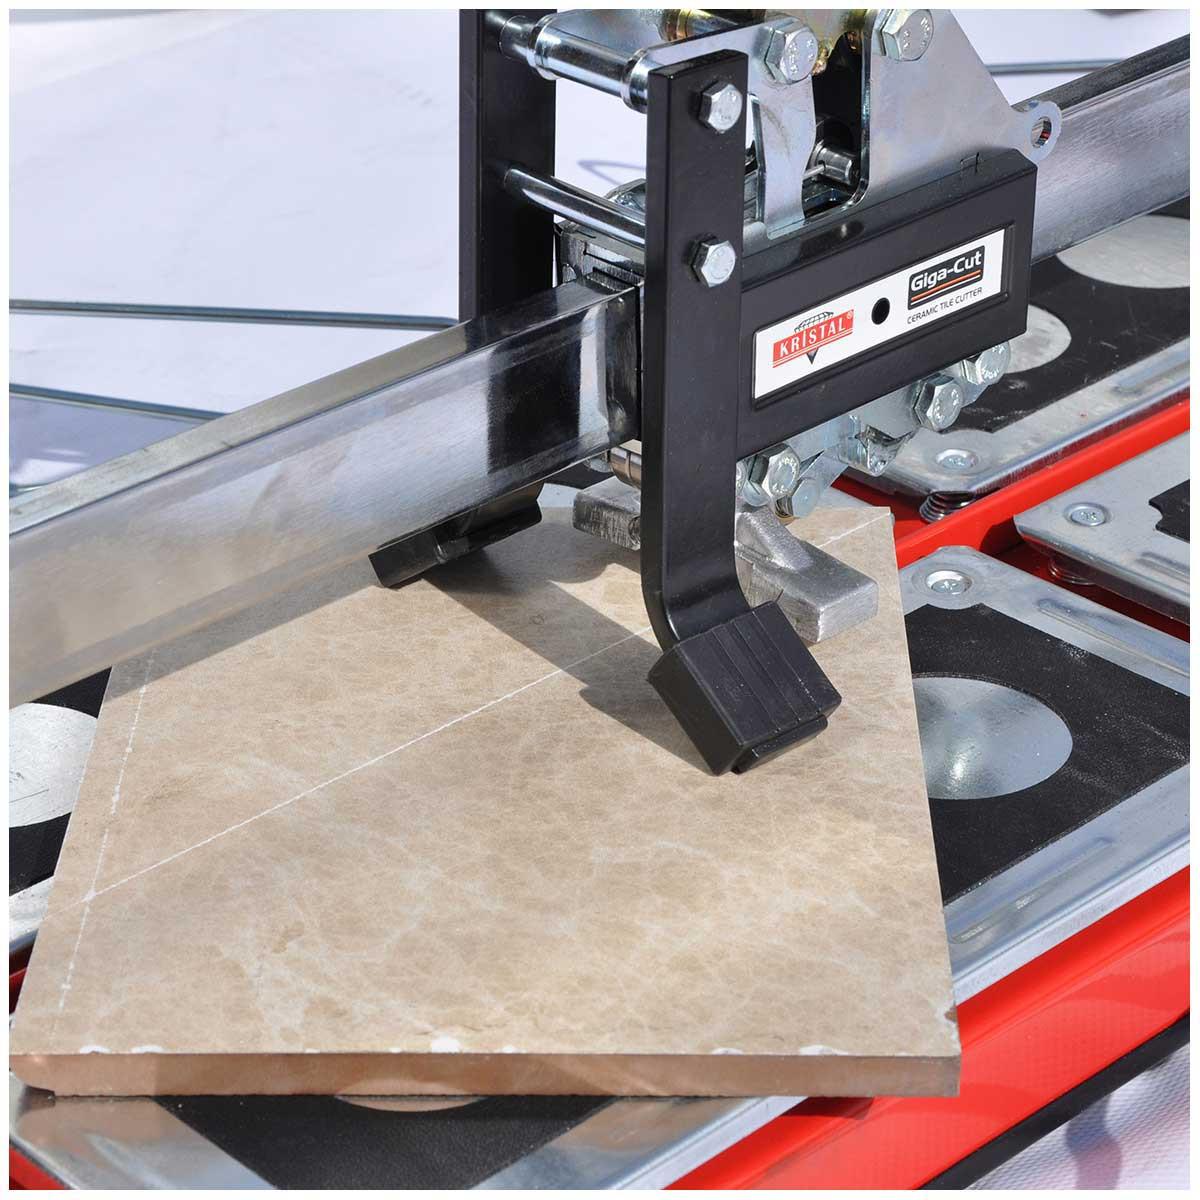 Kristal Giga-Cut Tile breaking